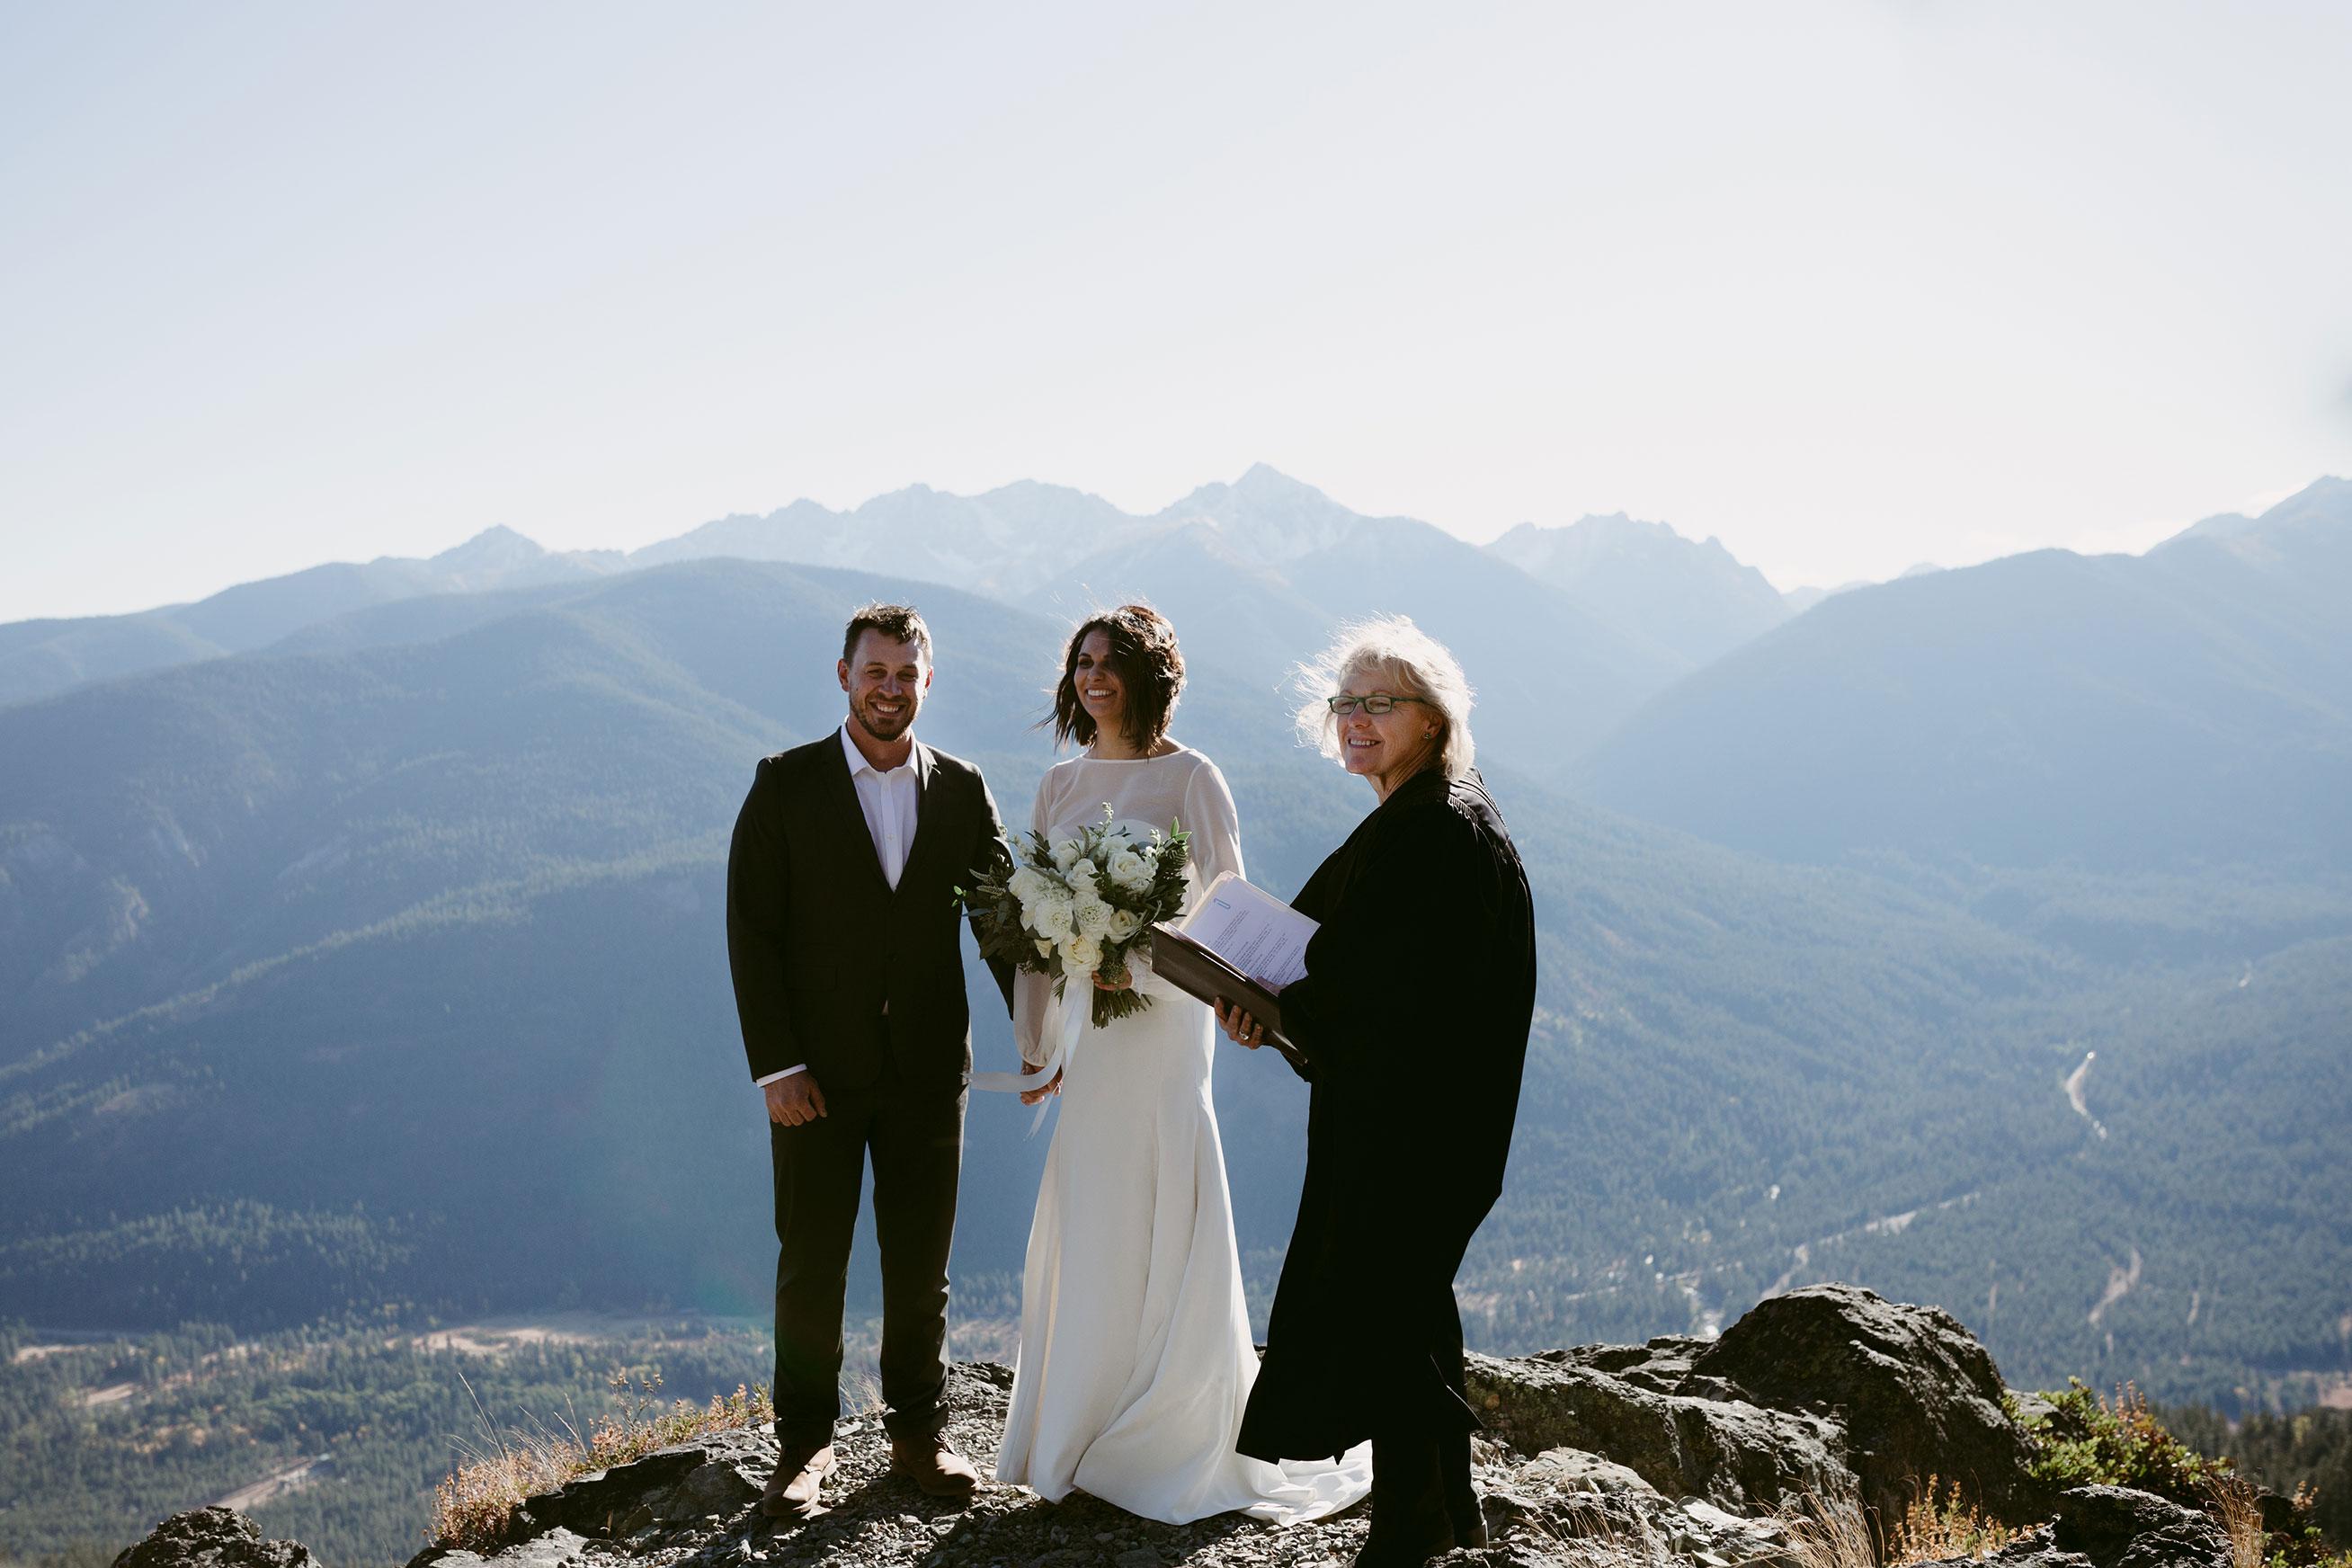 Intimate Mountain Elopement Goat Peak